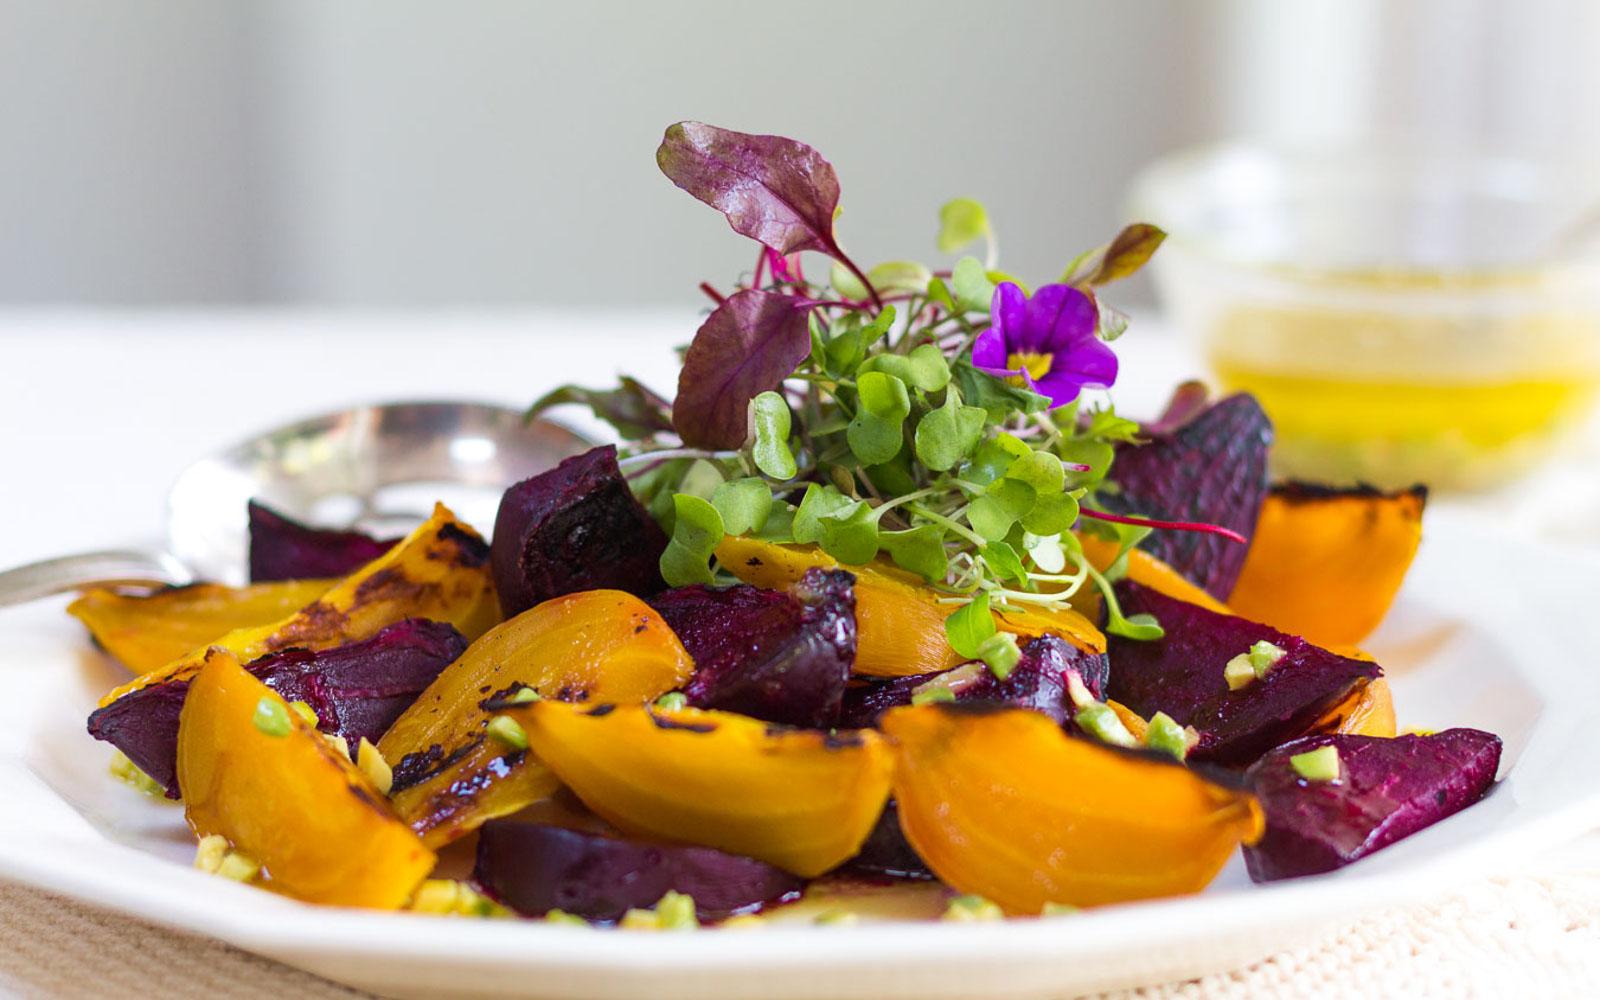 Wood Fired Beet Salad with Avocado-Citrus Vinaigrette